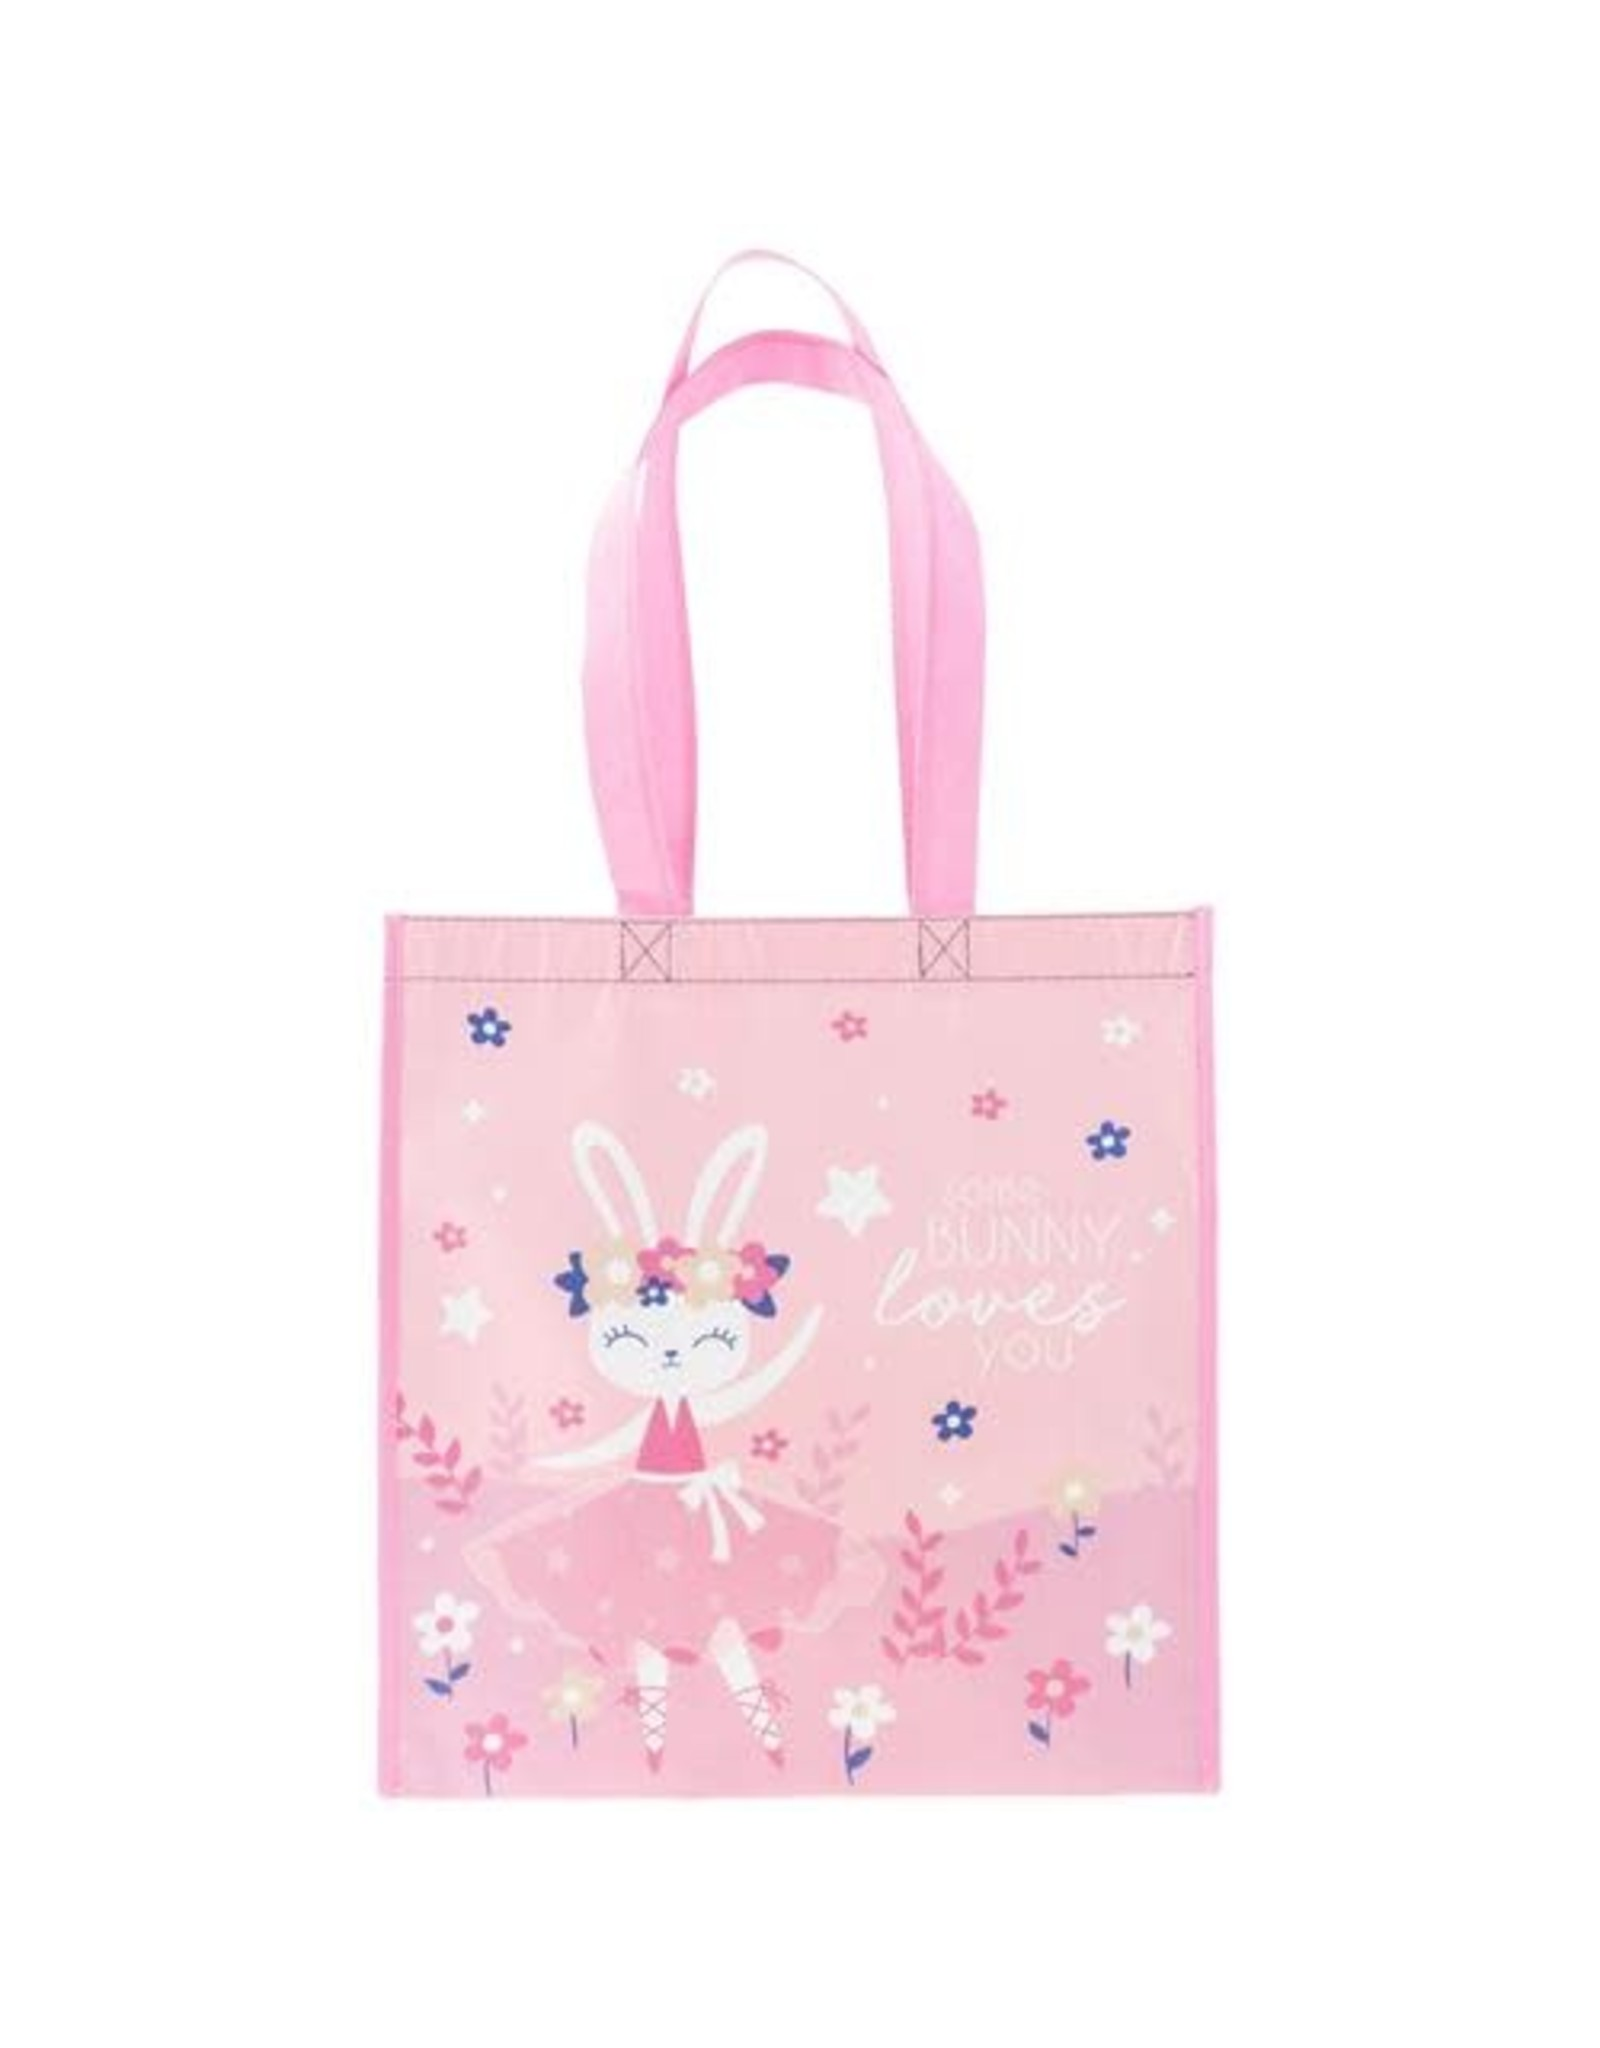 stephen joseph Stephen Joseph- Large Recycled Gift Bag: Bunny